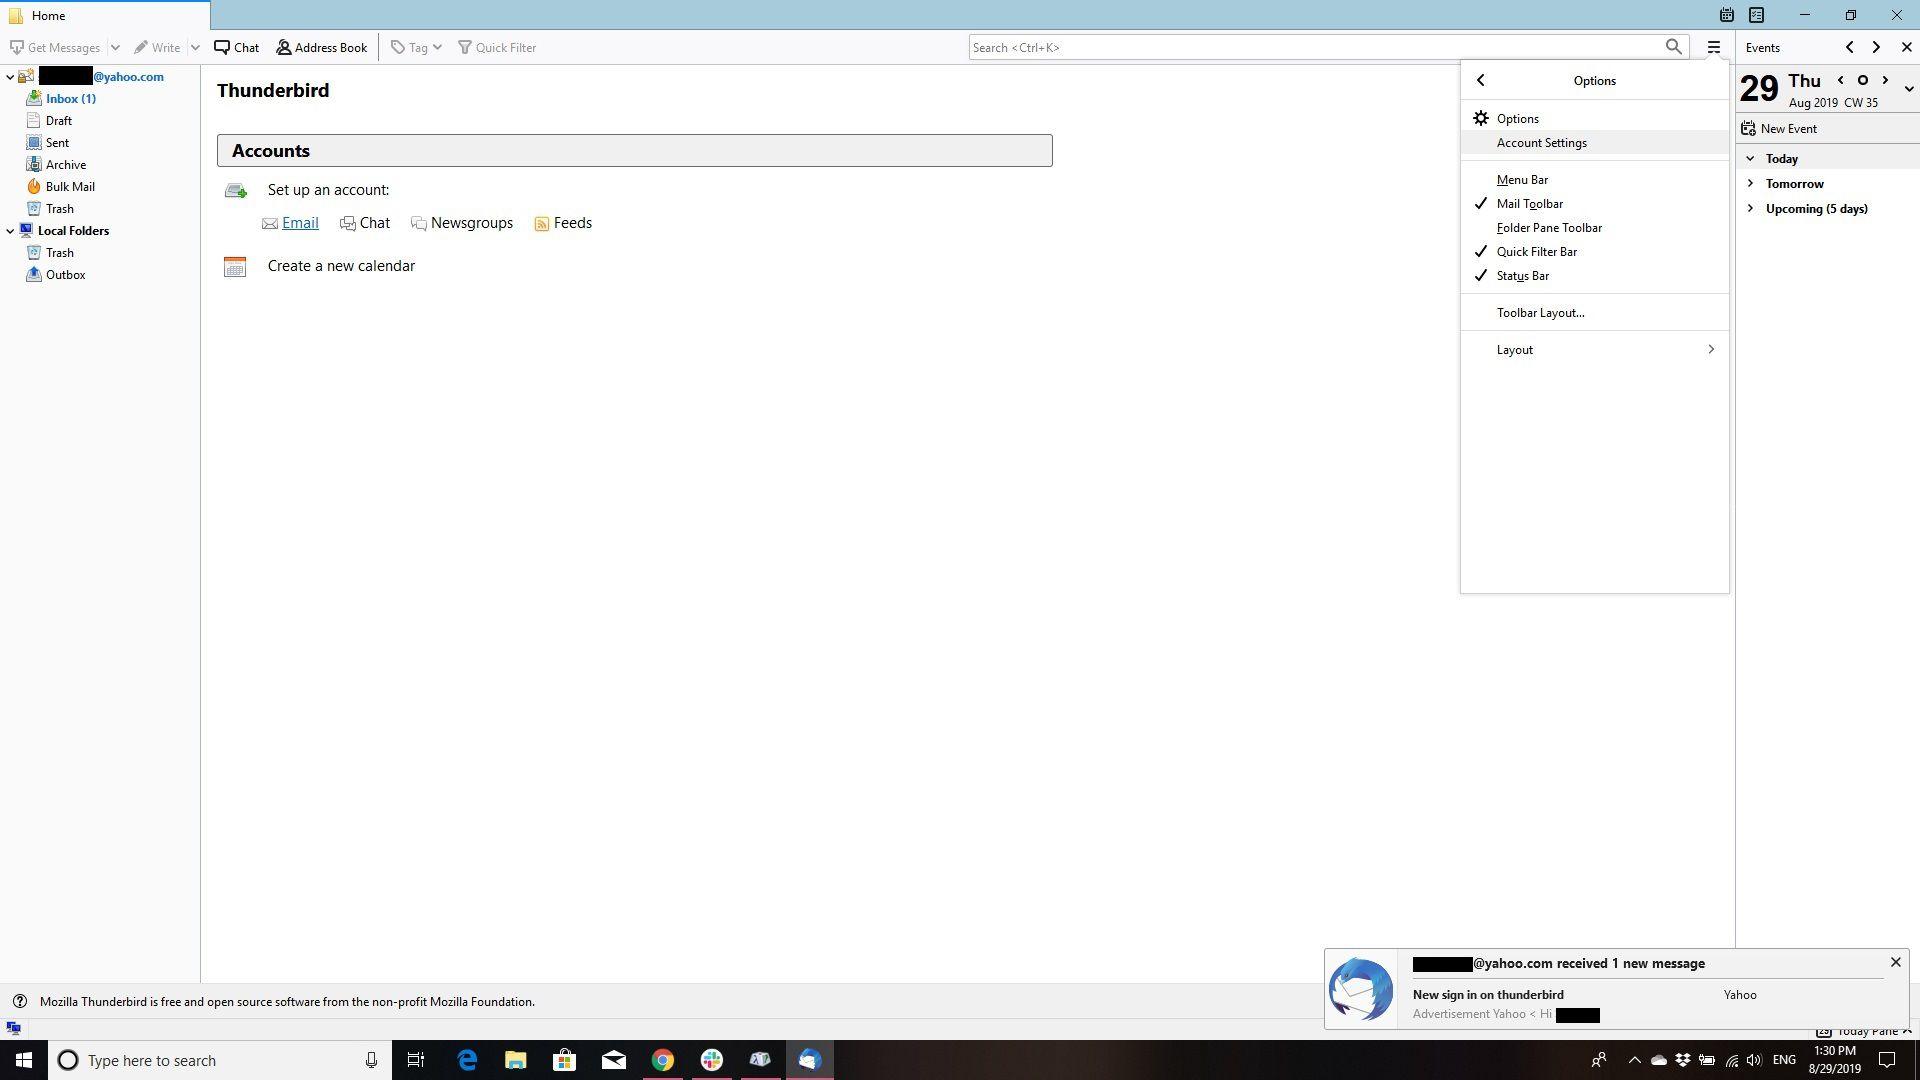 Screenshot depicting the Thunderbird account settings menu option